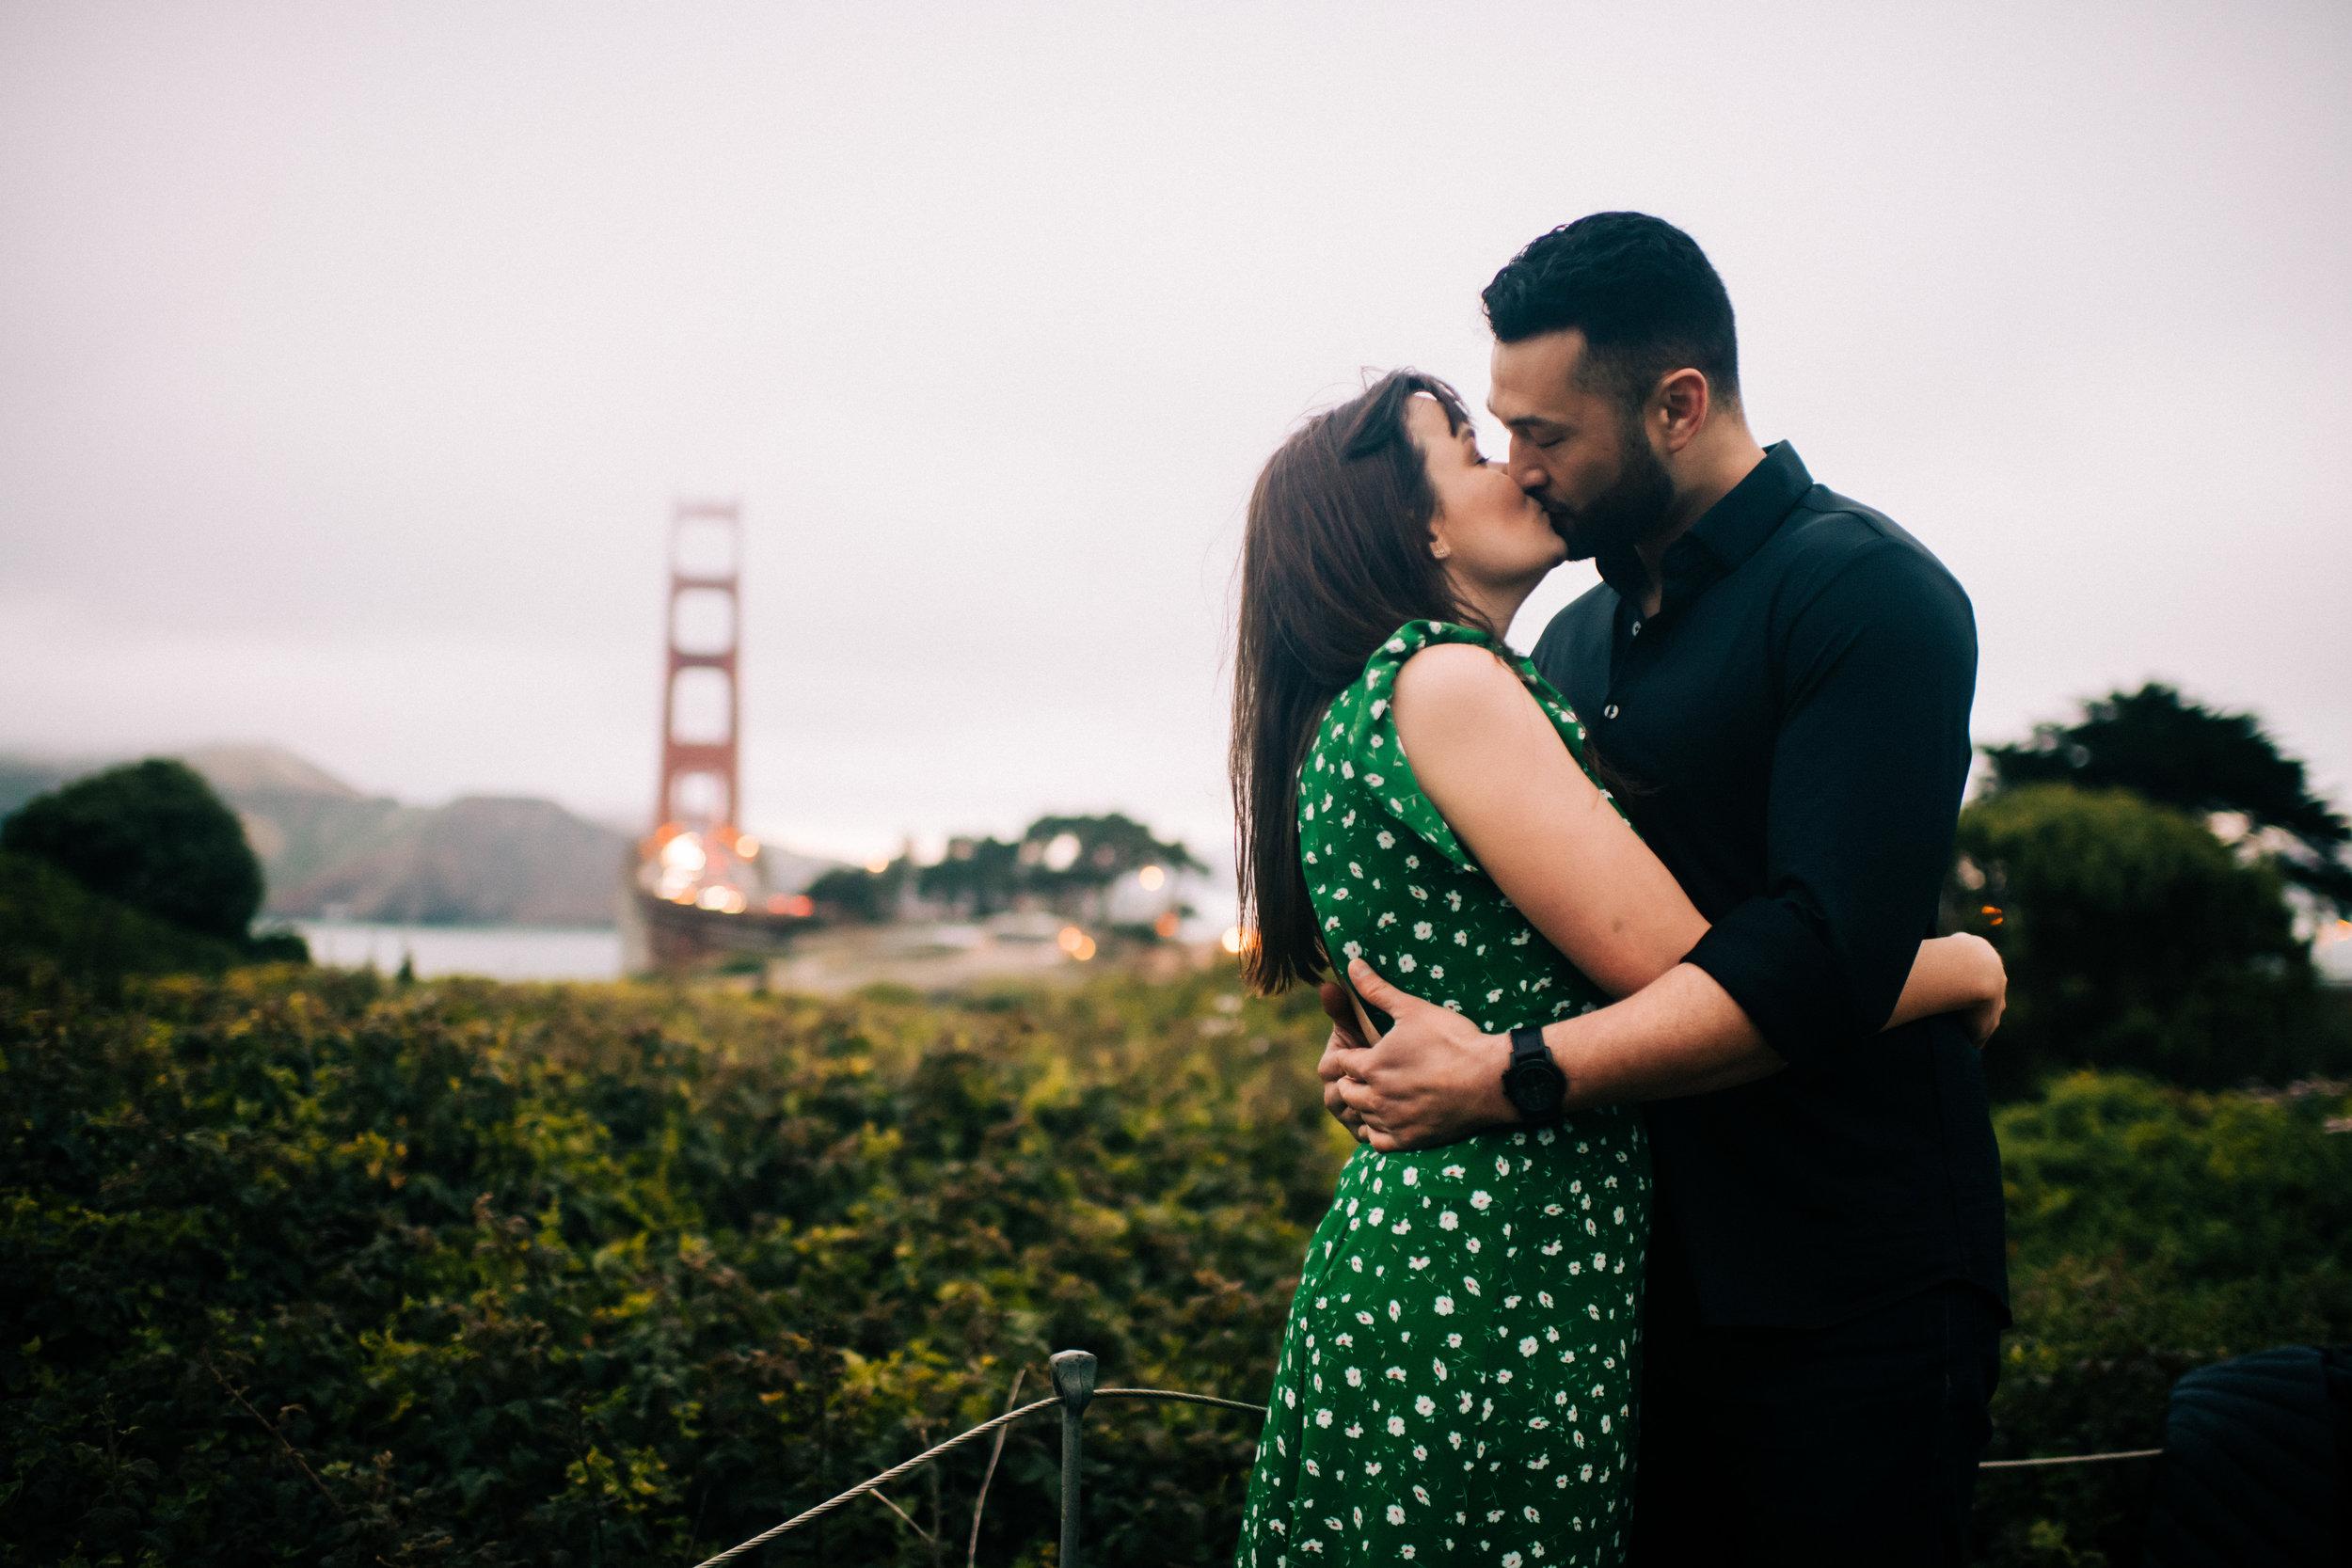 bay area lands end sutro baths oakland san francisco engagement wedding nontraditional fun creative eclectic photographer magic-465.jpg